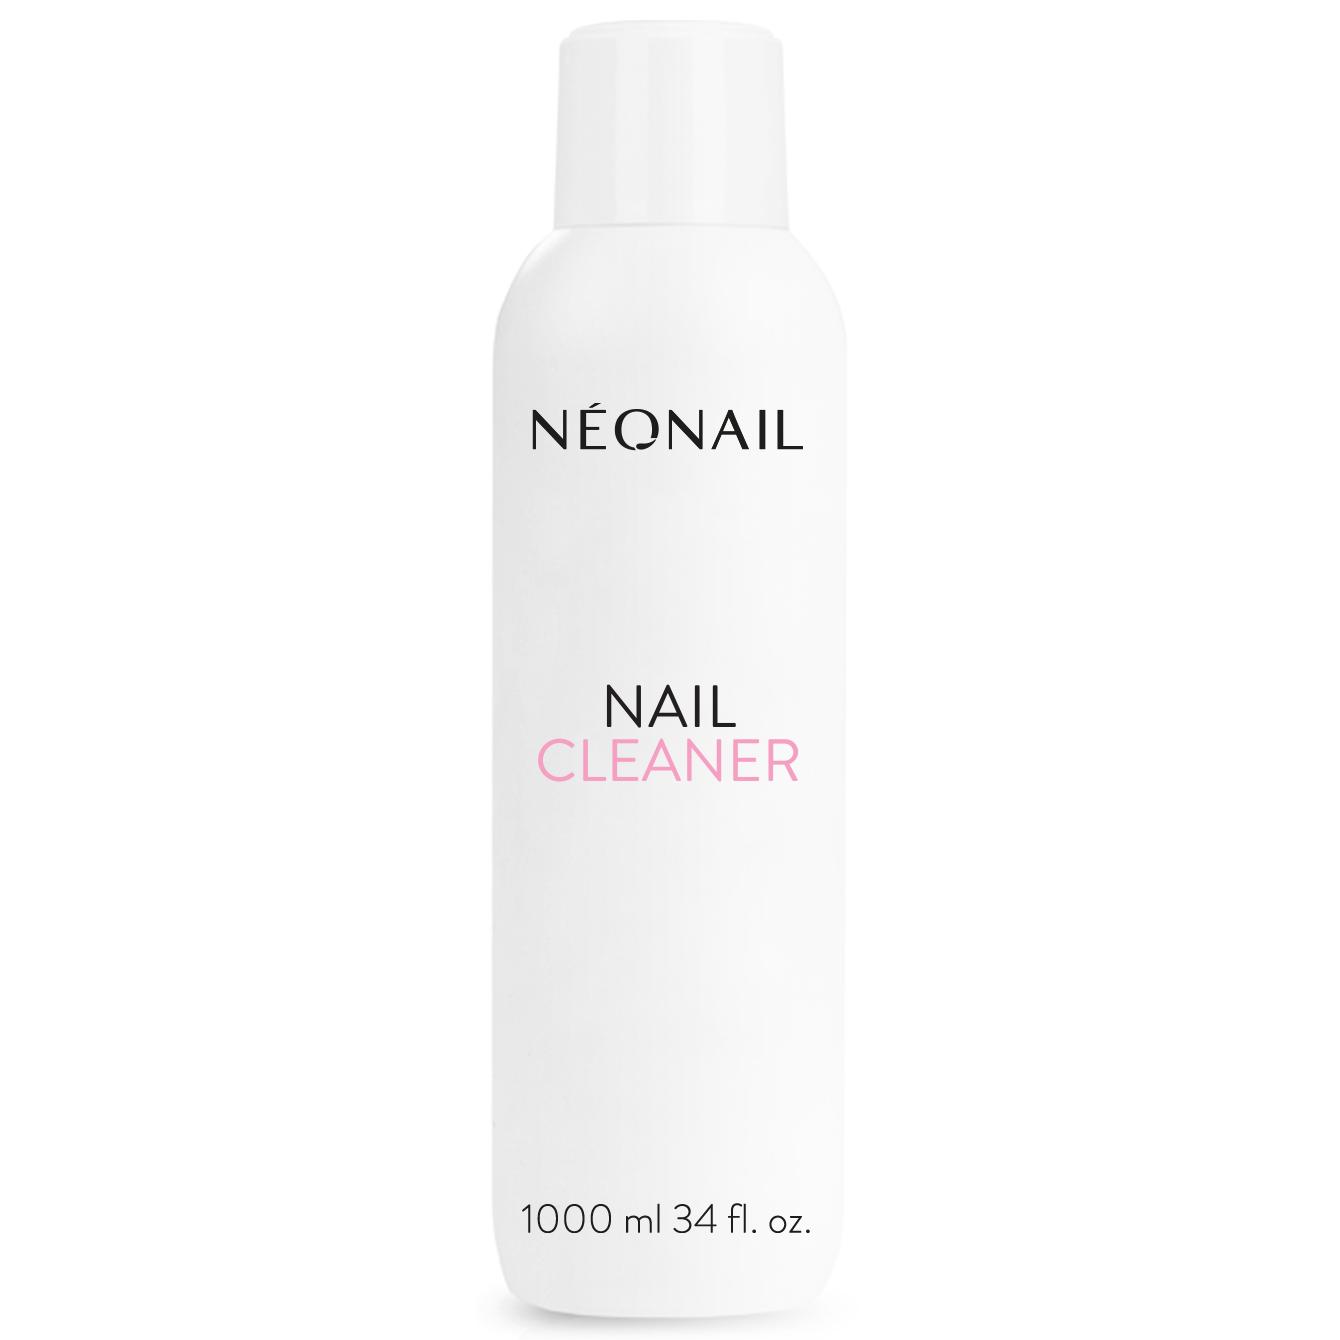 Nail Cleaner NeoNail - 1000ml